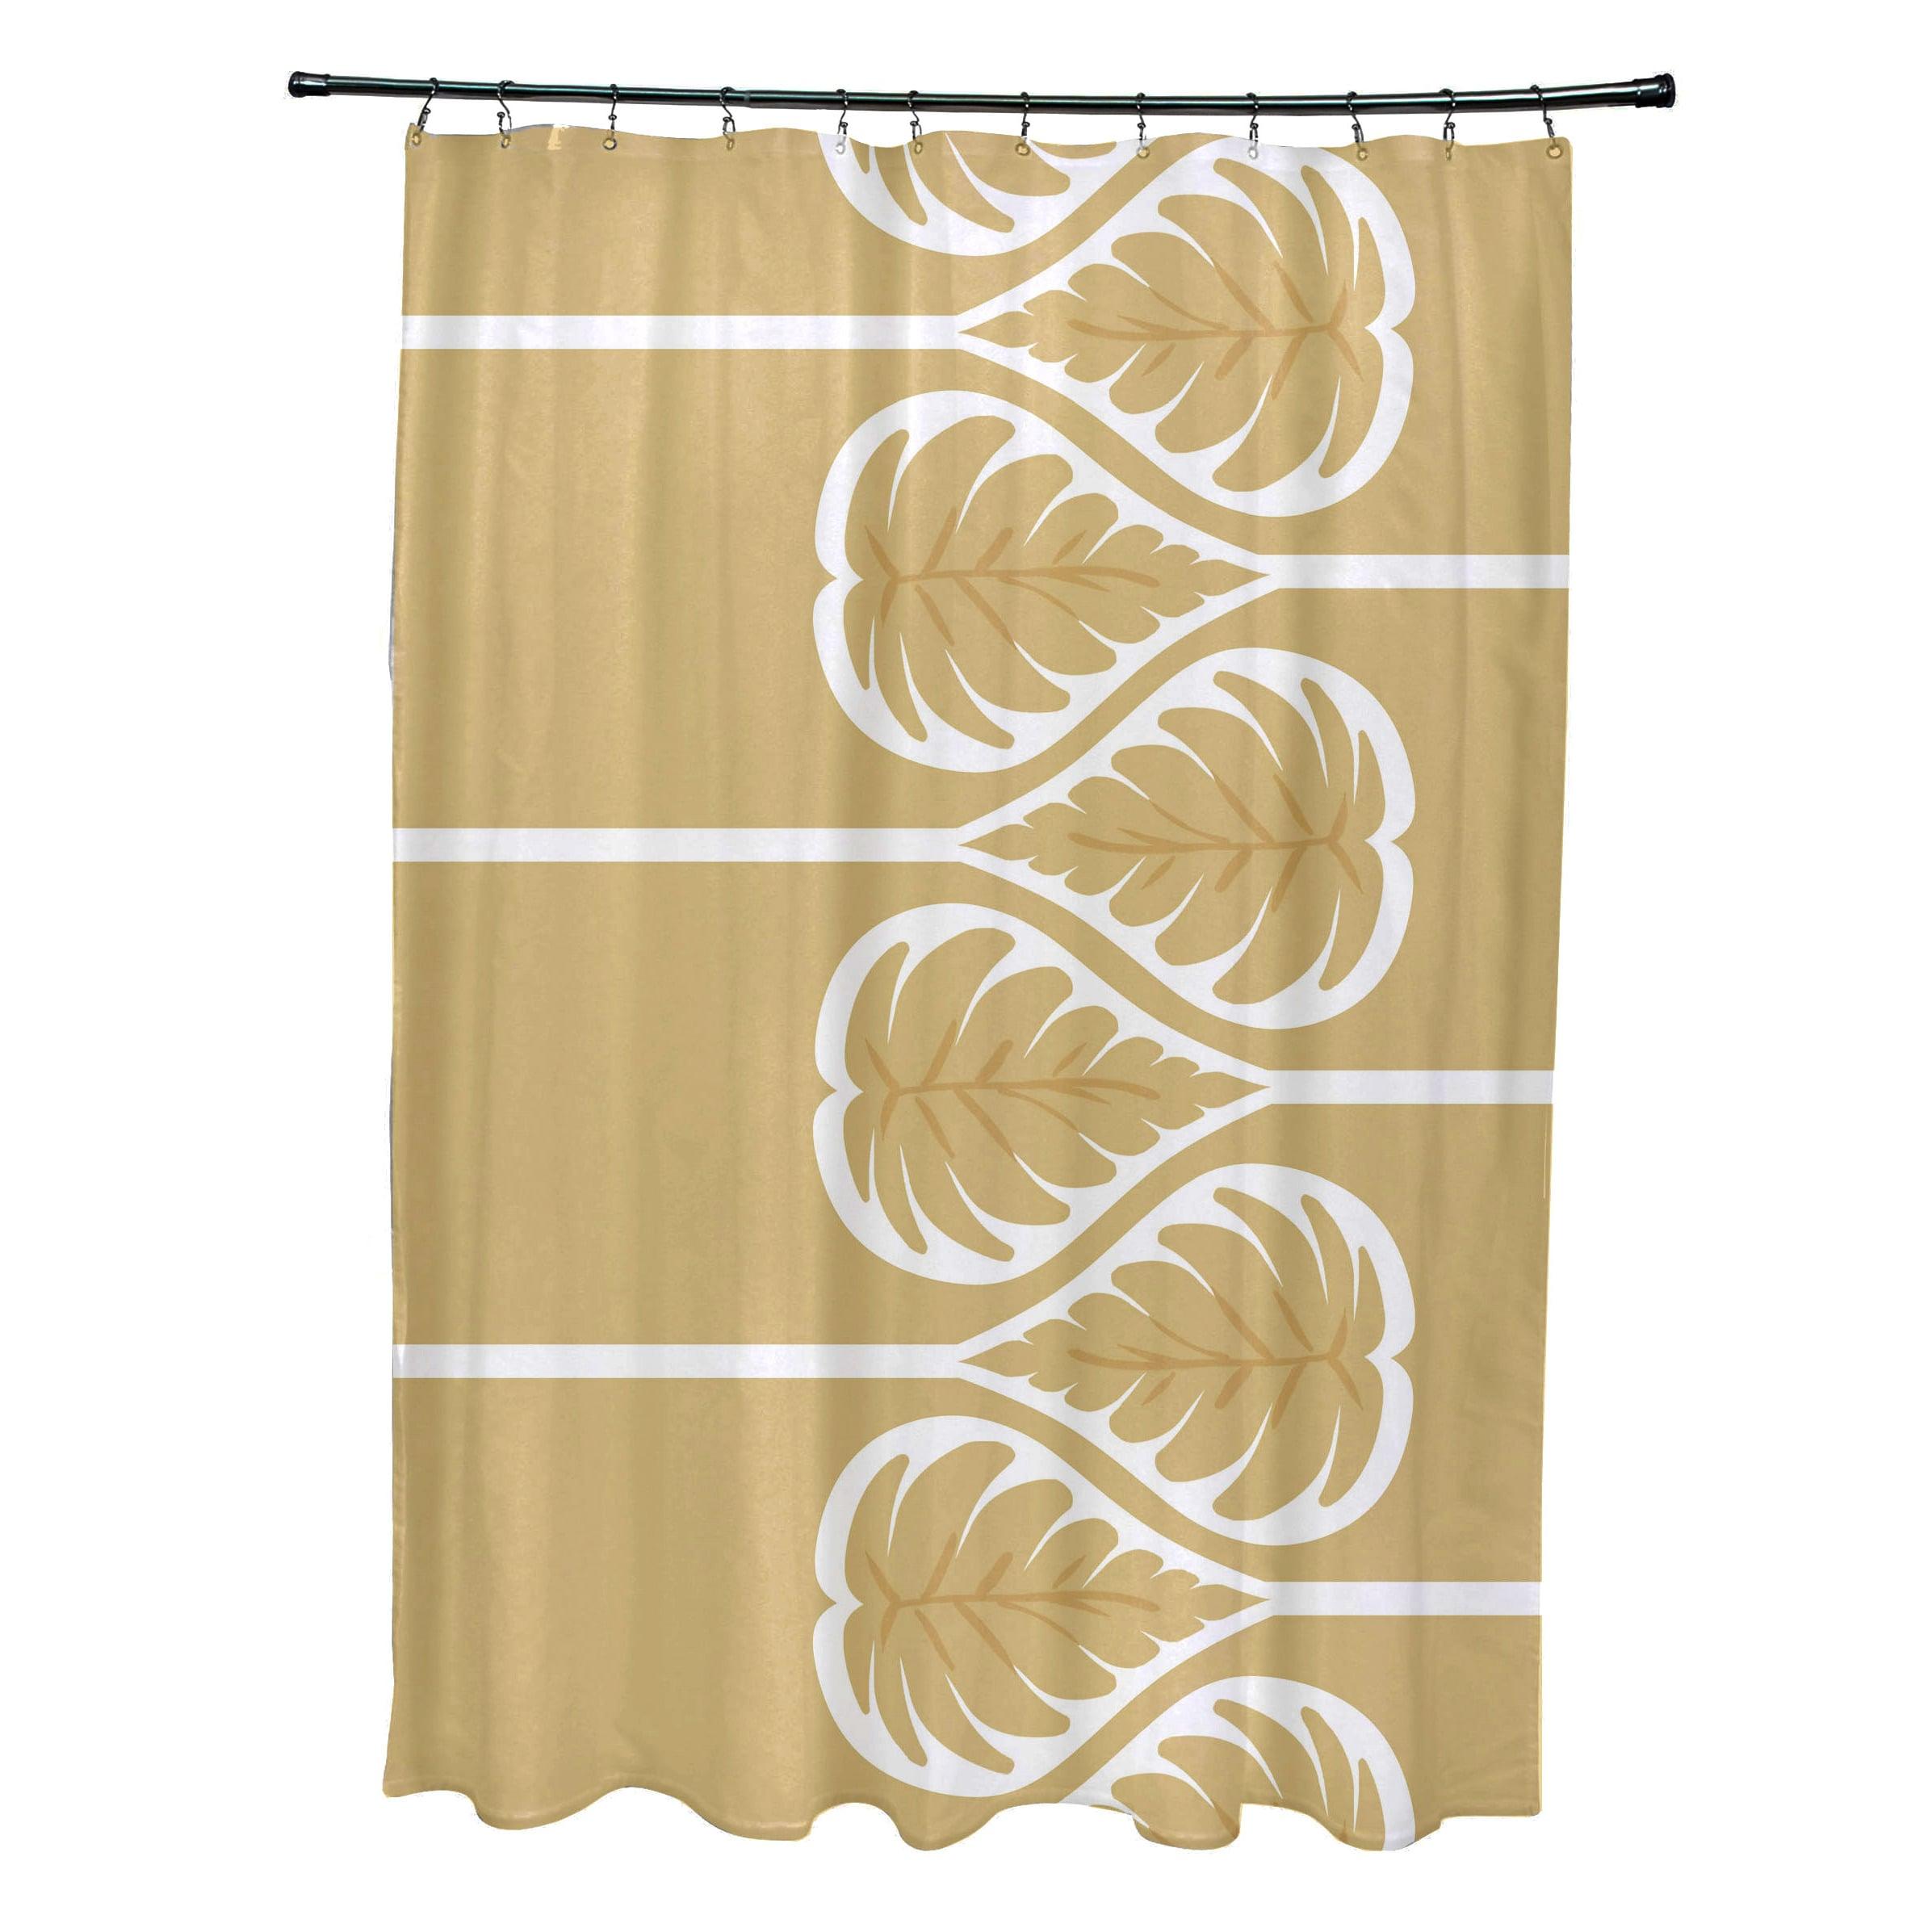 71 X 74 Inch Fern 1 Floral Print Shower Curtain